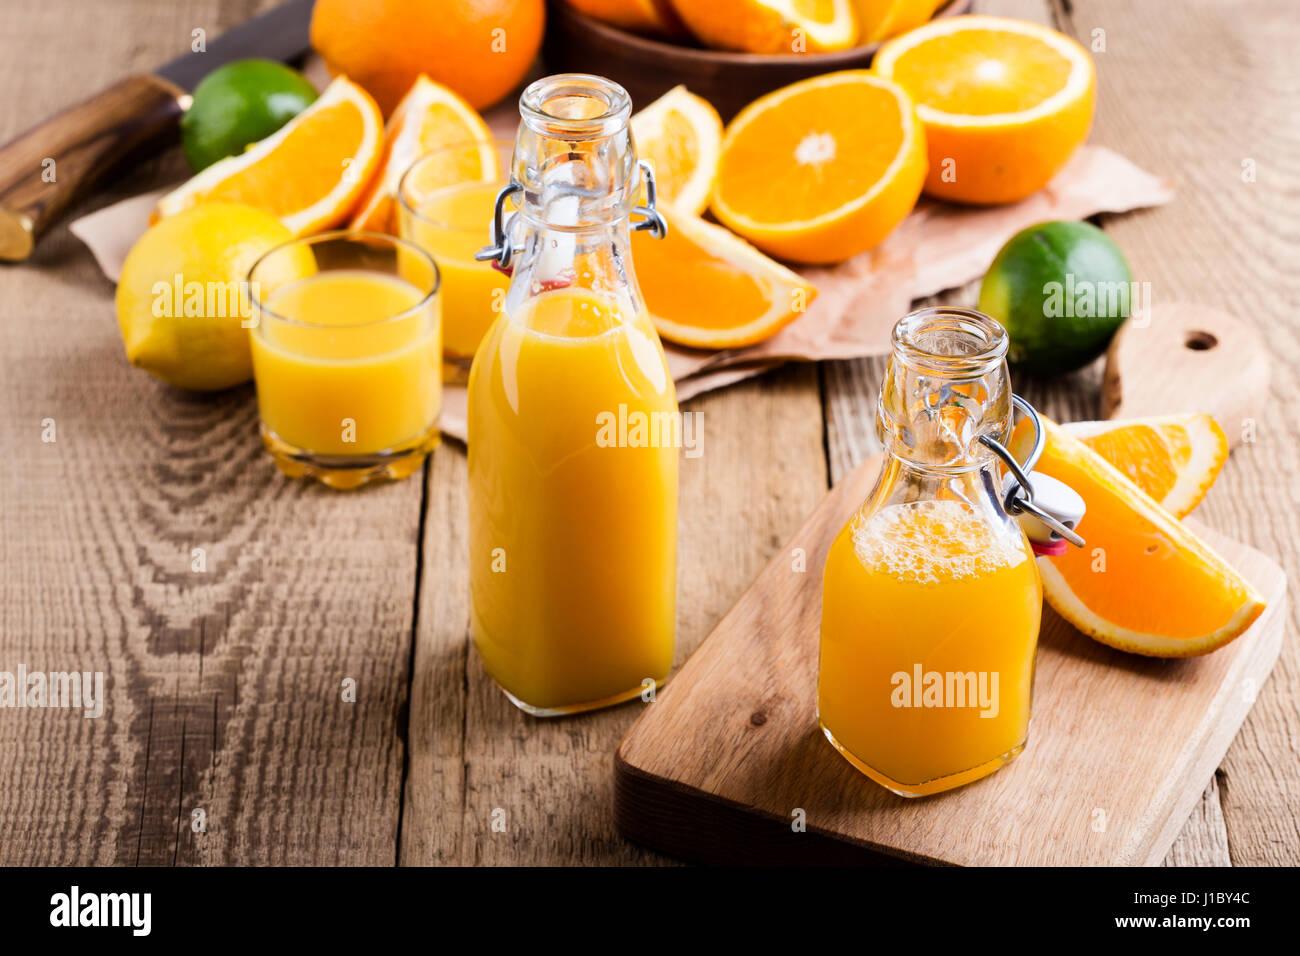 Freshly squeezed orange juice in bottles against the background of fresh  citrus fruits - Stock Image